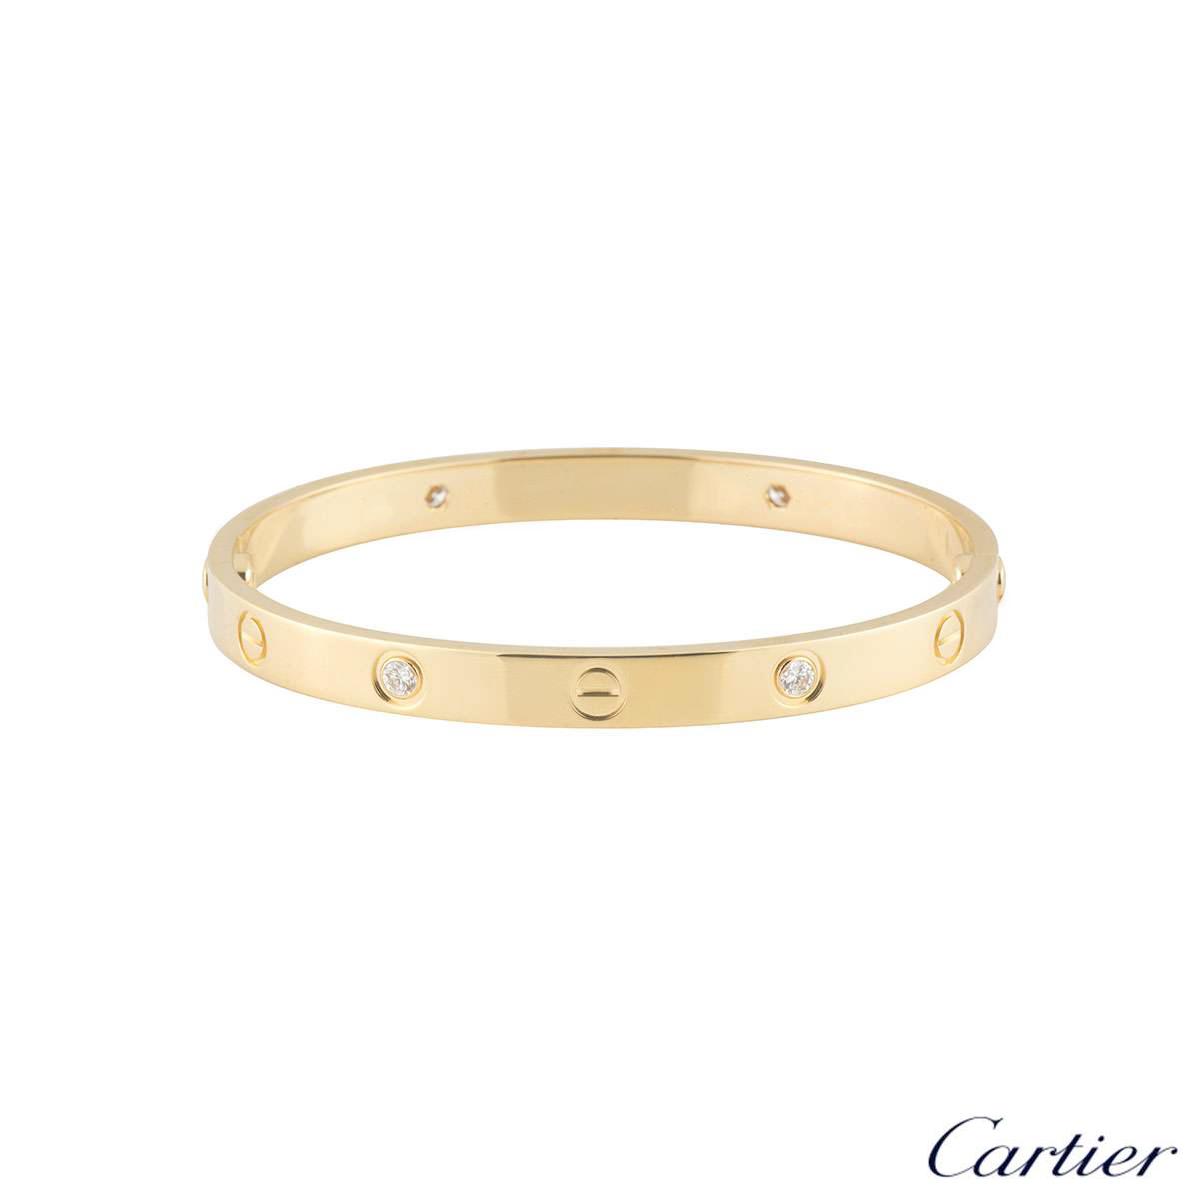 Cartier Yellow Gold Half Diamond Love Bracelet Size 17 B6035917